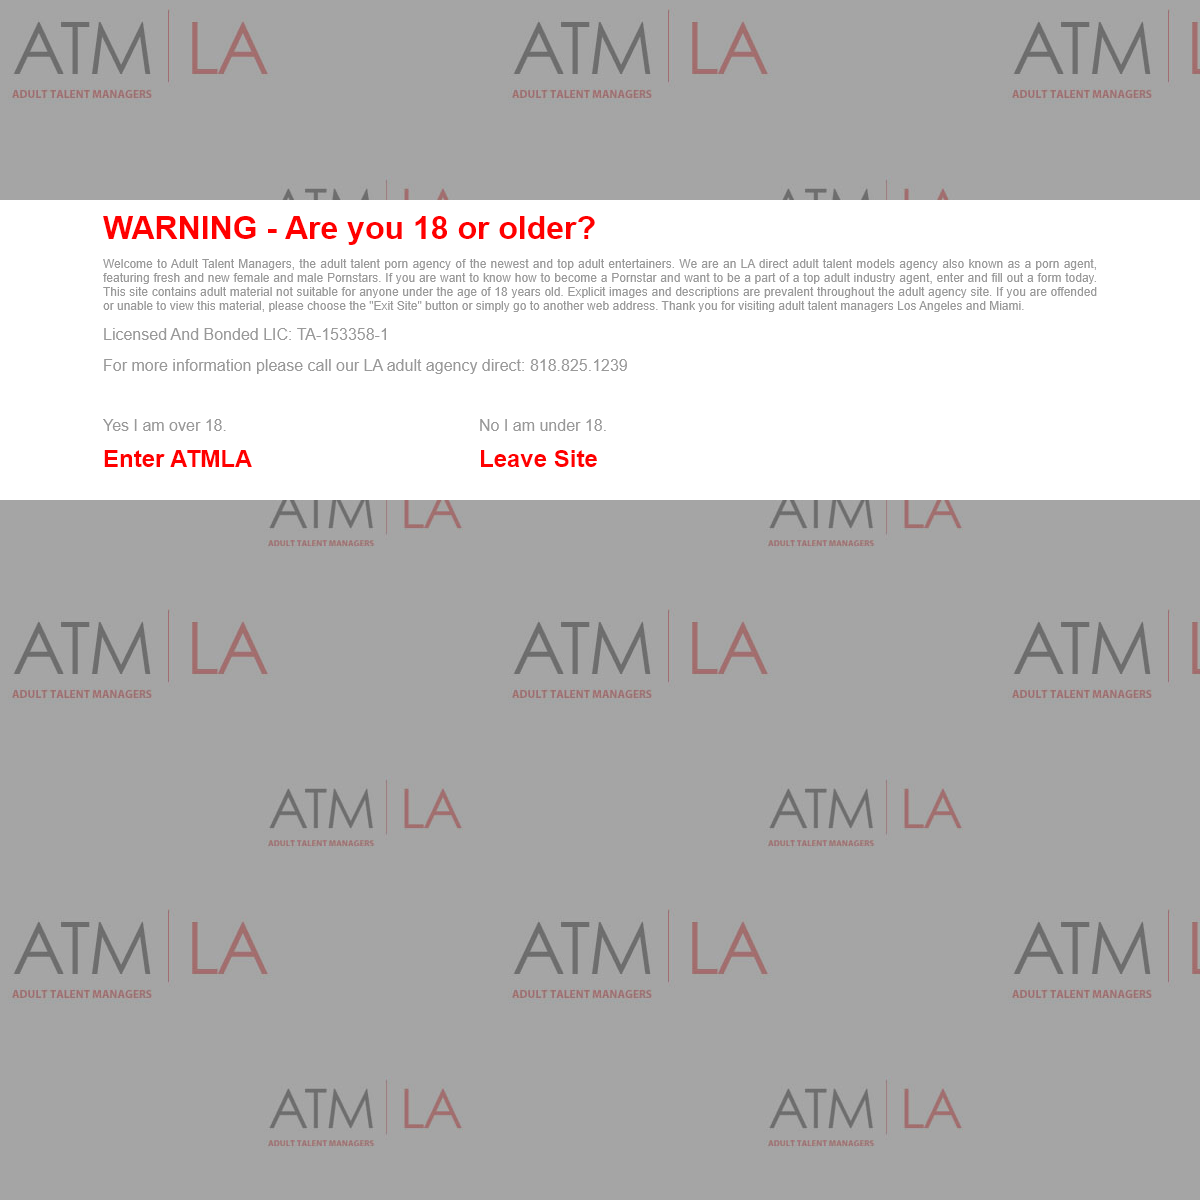 A complete backup of www.atmla.com